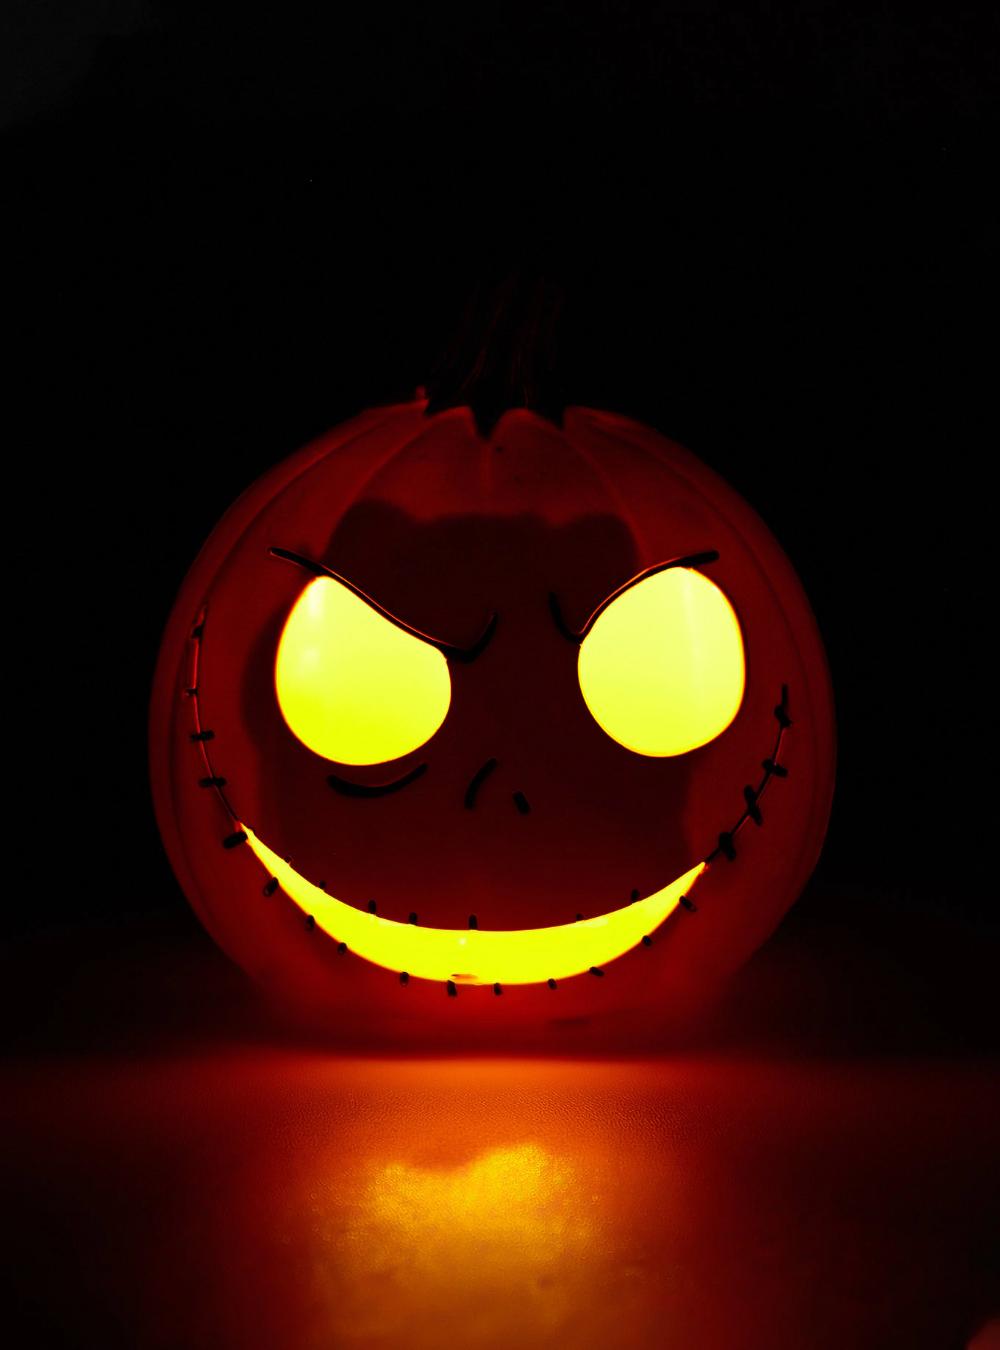 The Nightmare Before Christmas Jack Skellington Pumpkin